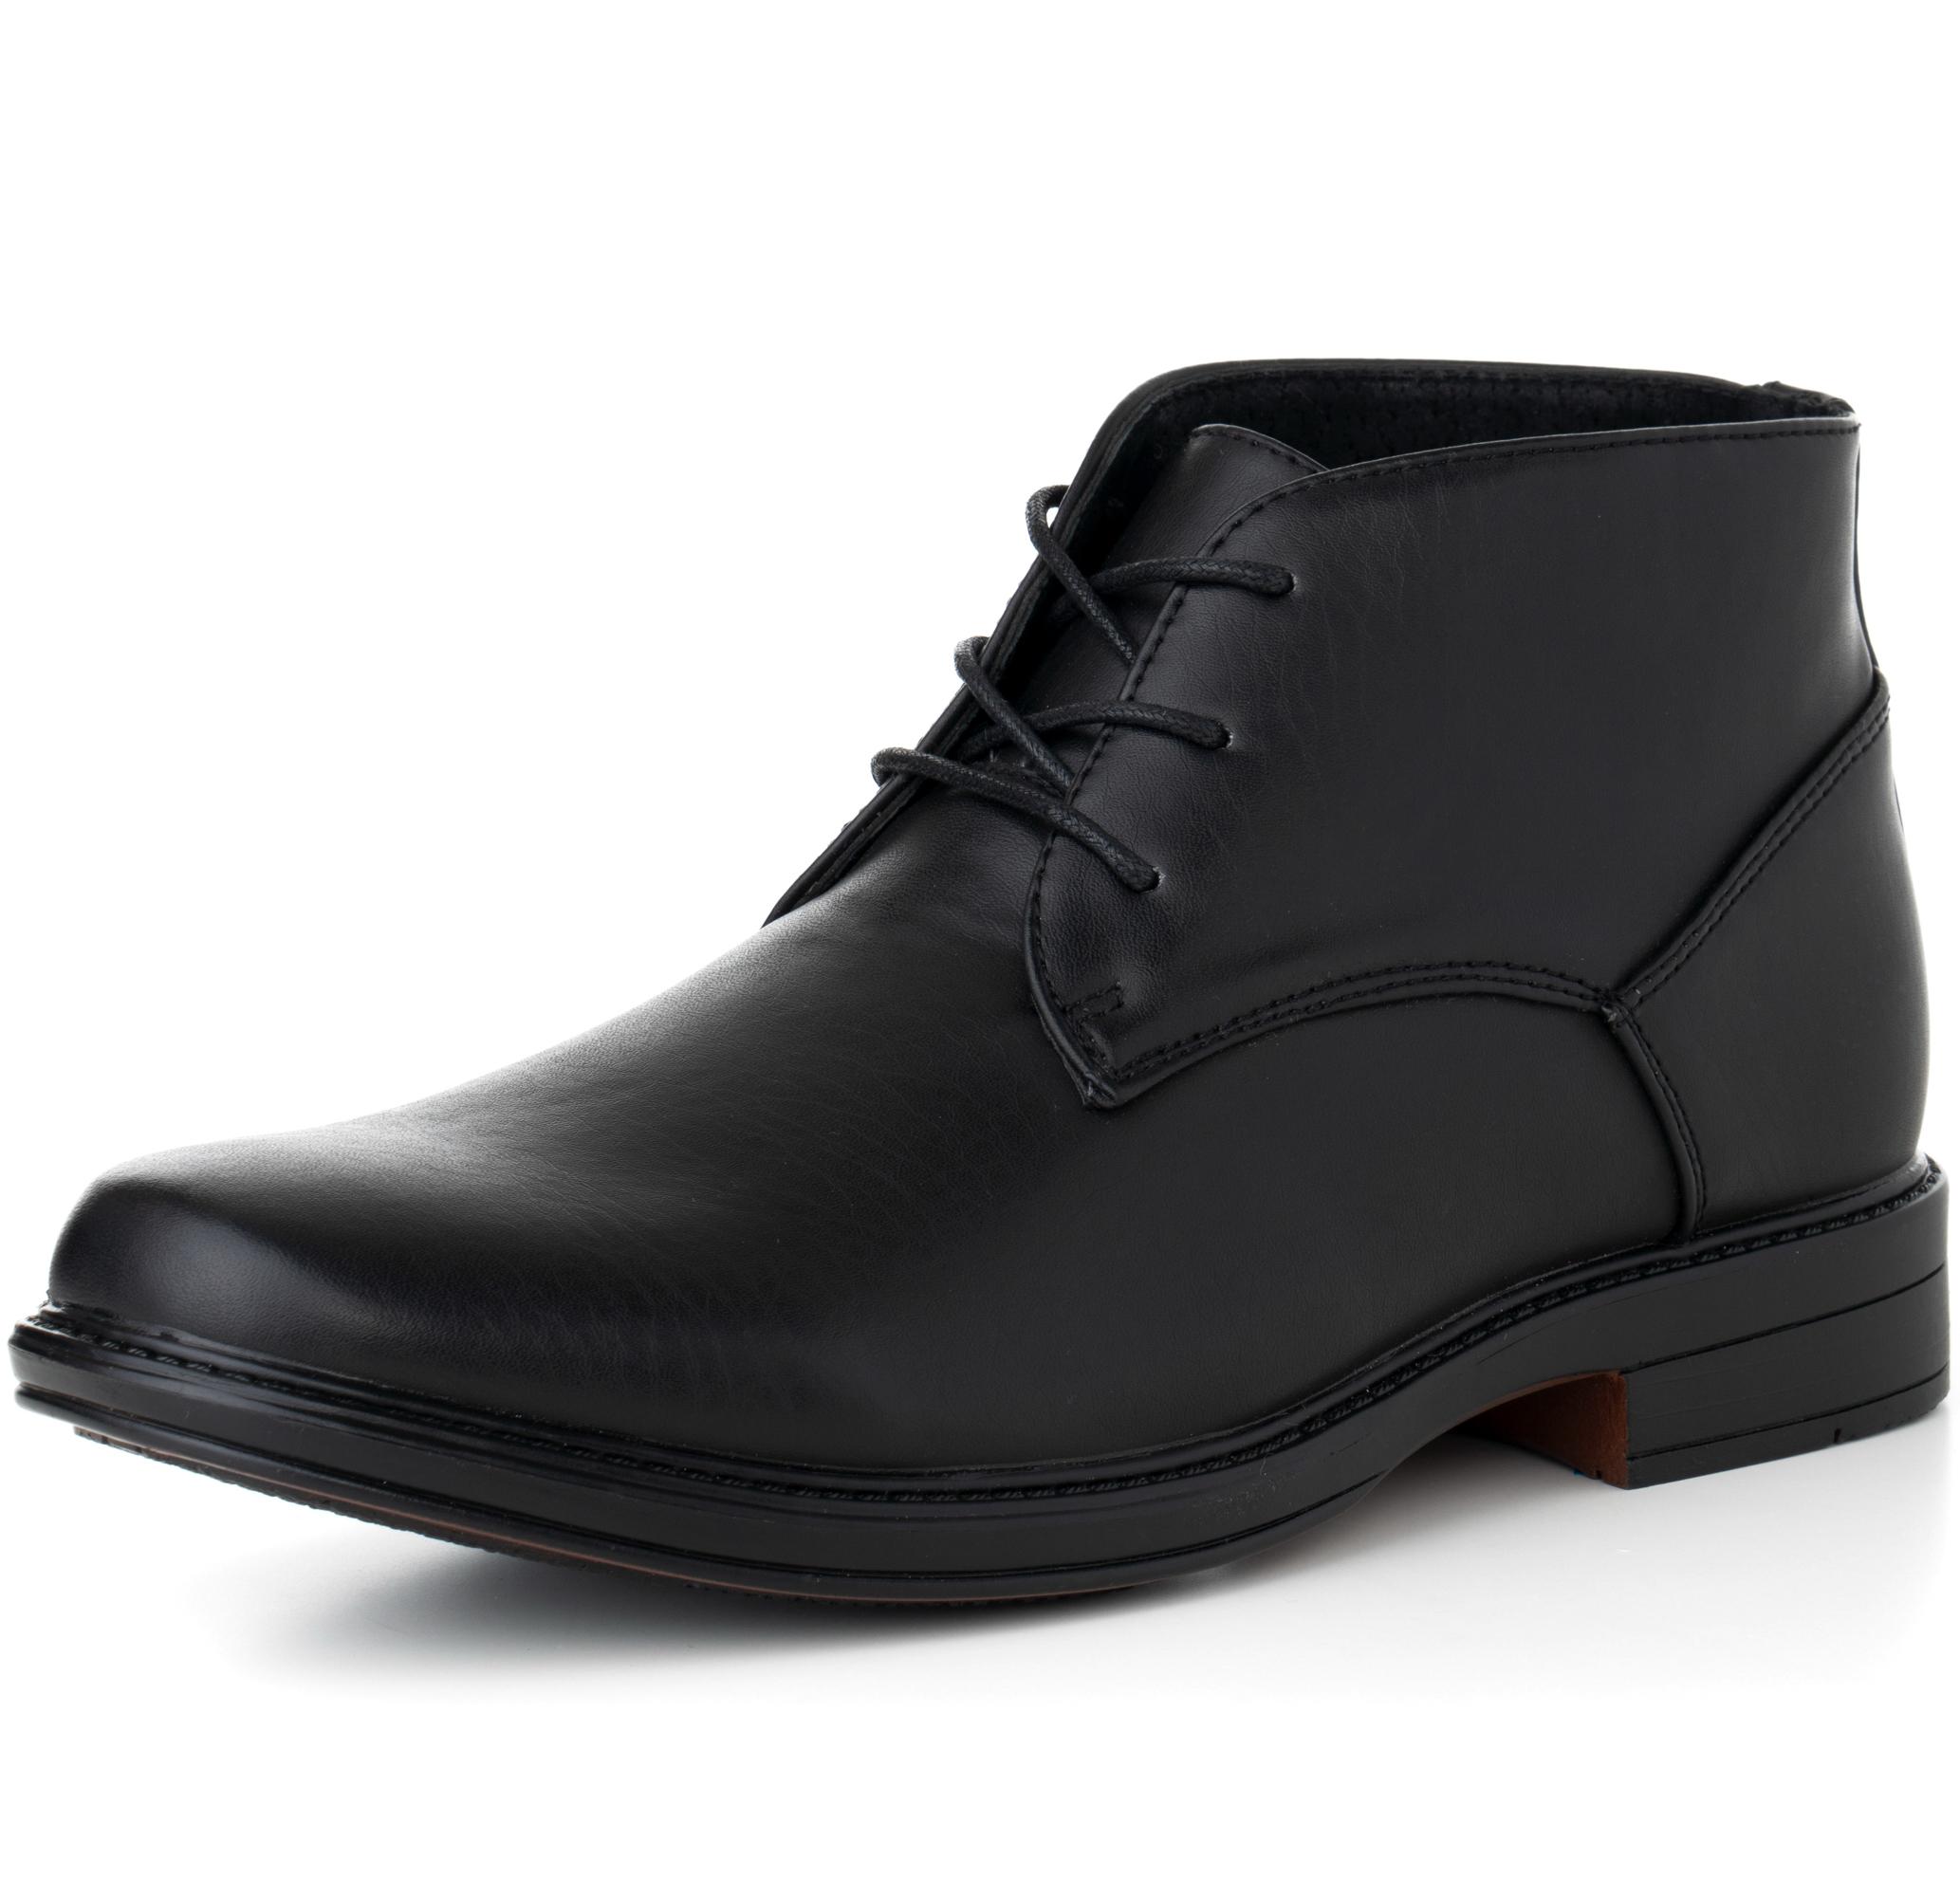 boots dressy